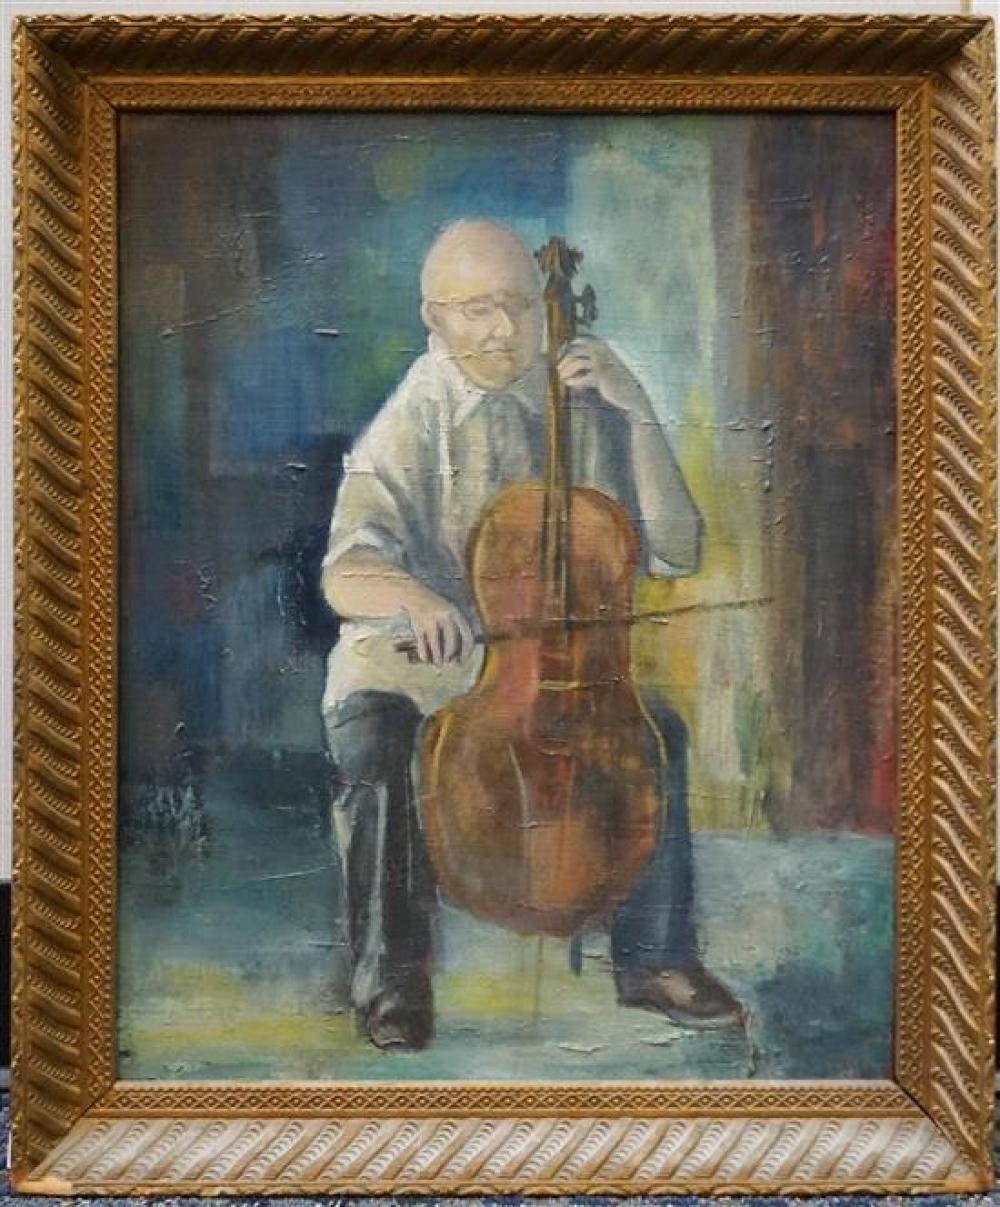 Isaiah Davis Durham (American 1913-1999), The Cellist, Oil on Canvas, Frame: 23 x 19 in